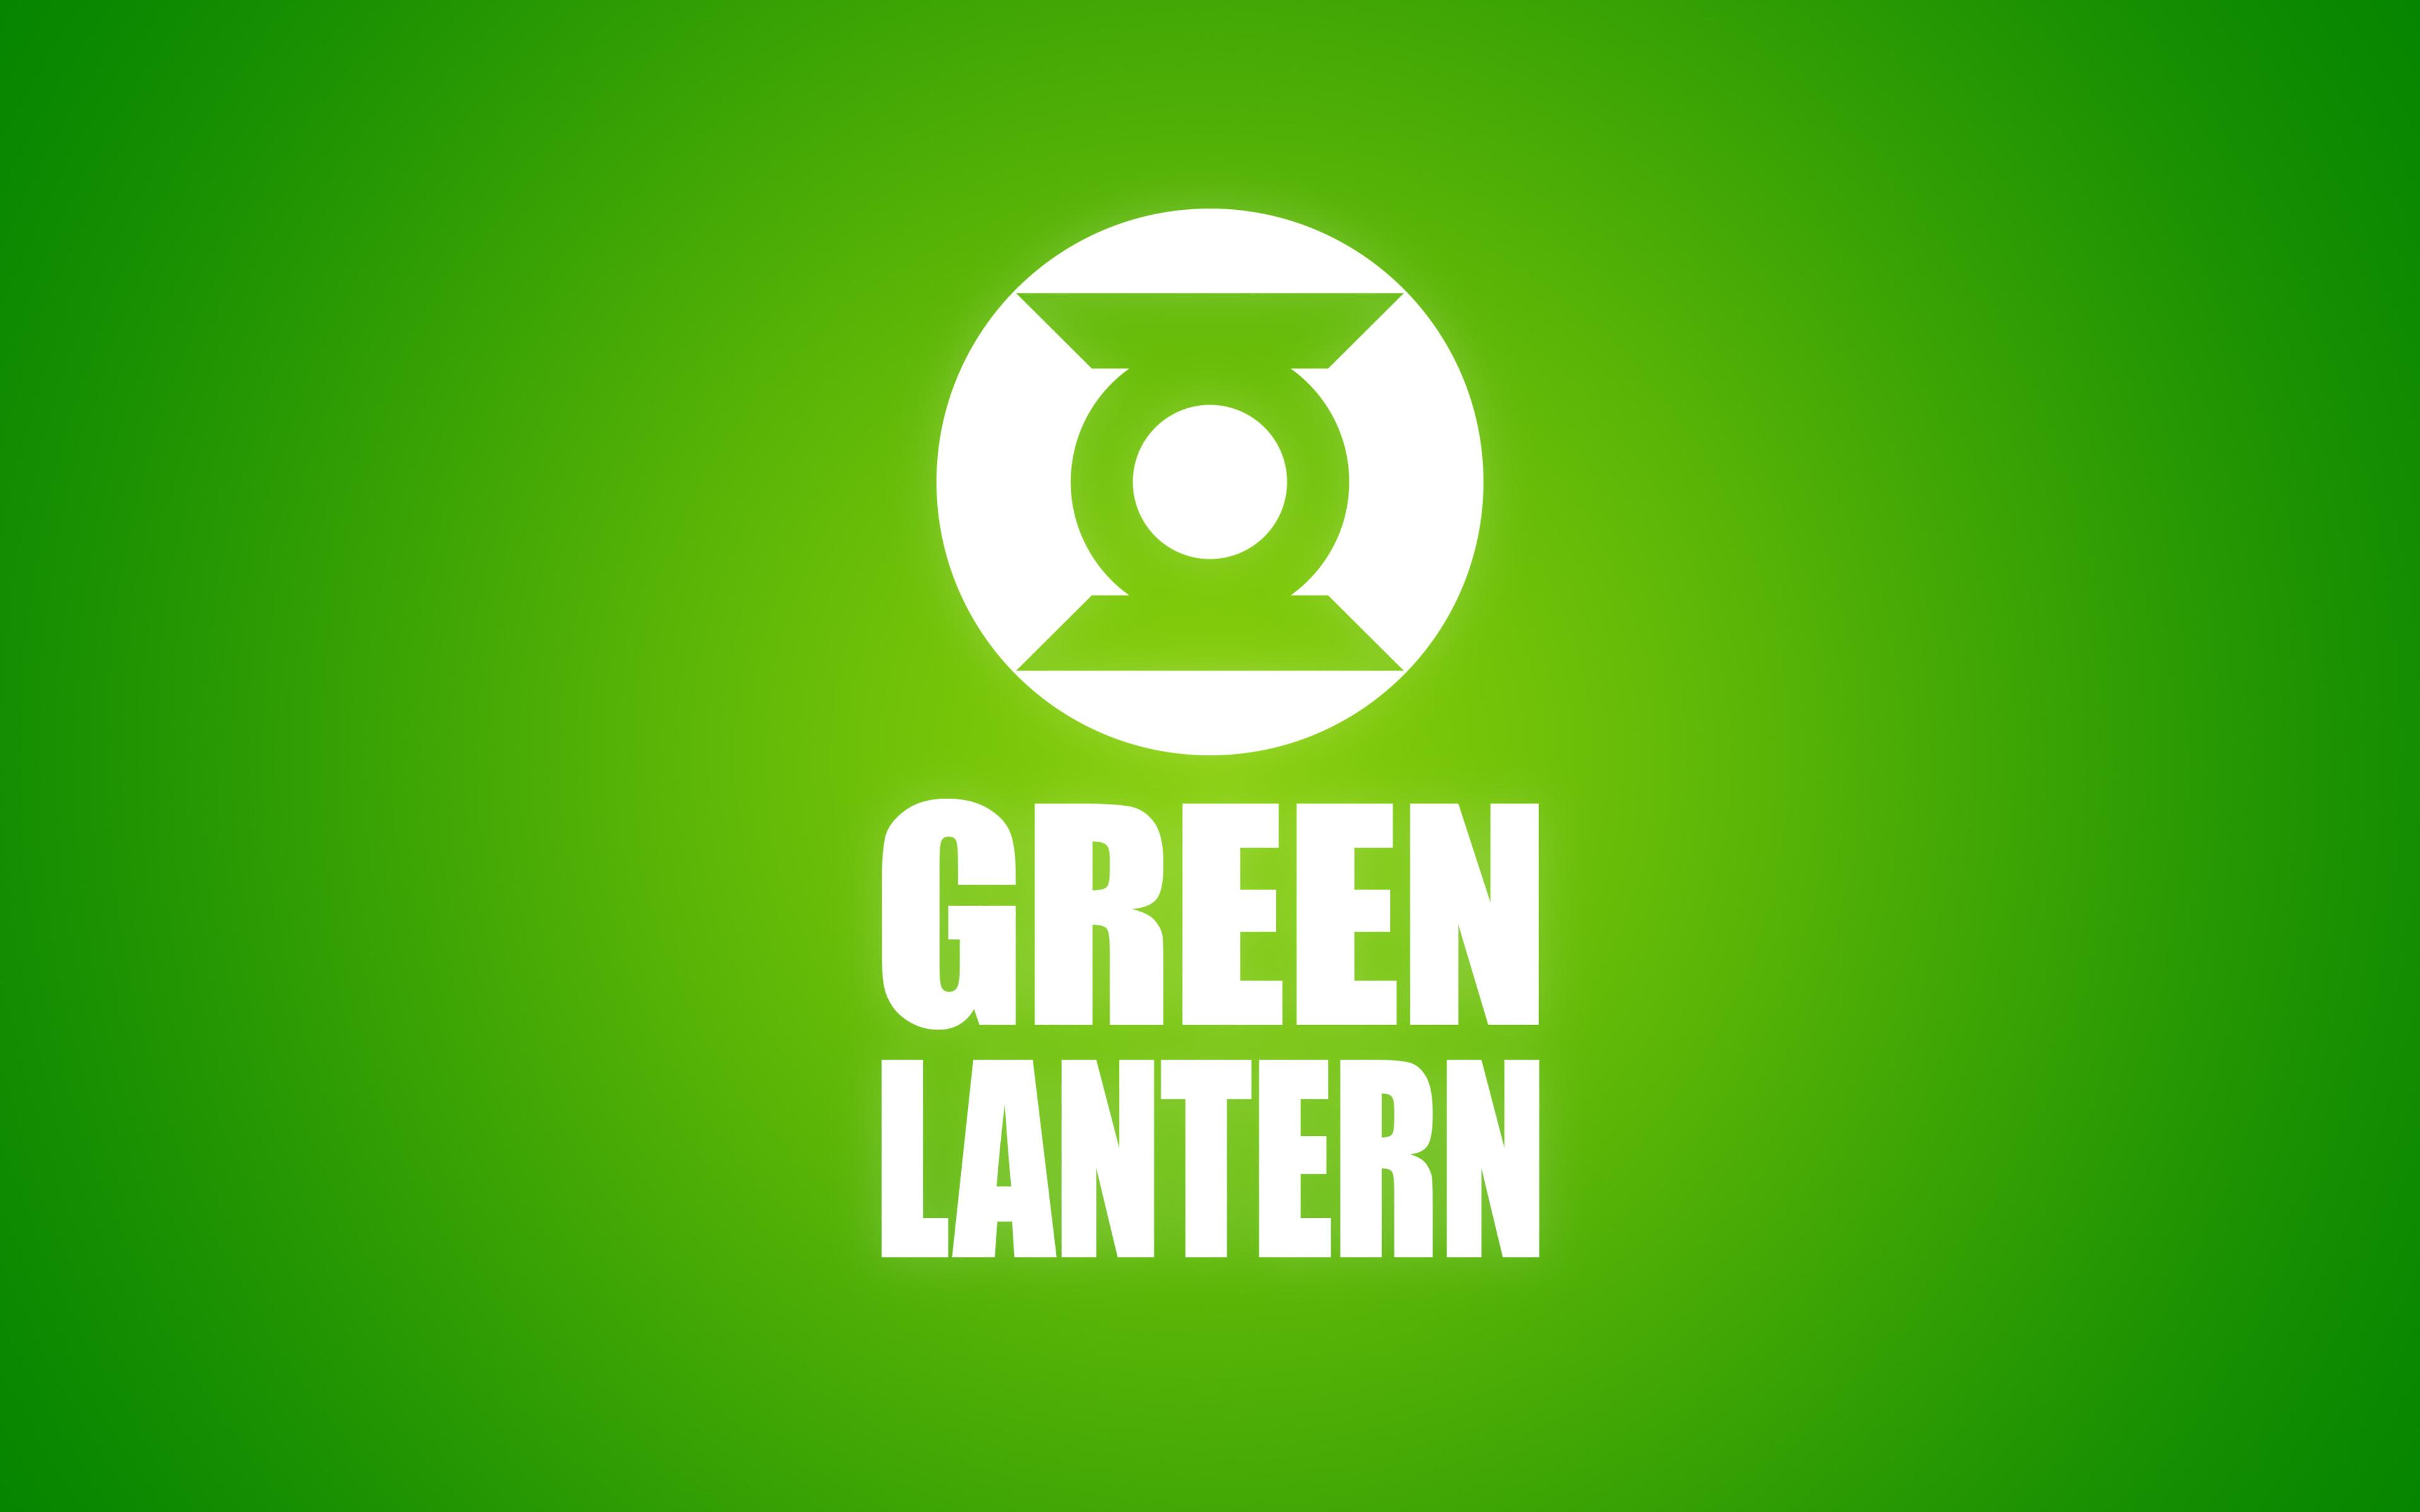 green-lantern-logo-4k-6h.jpg